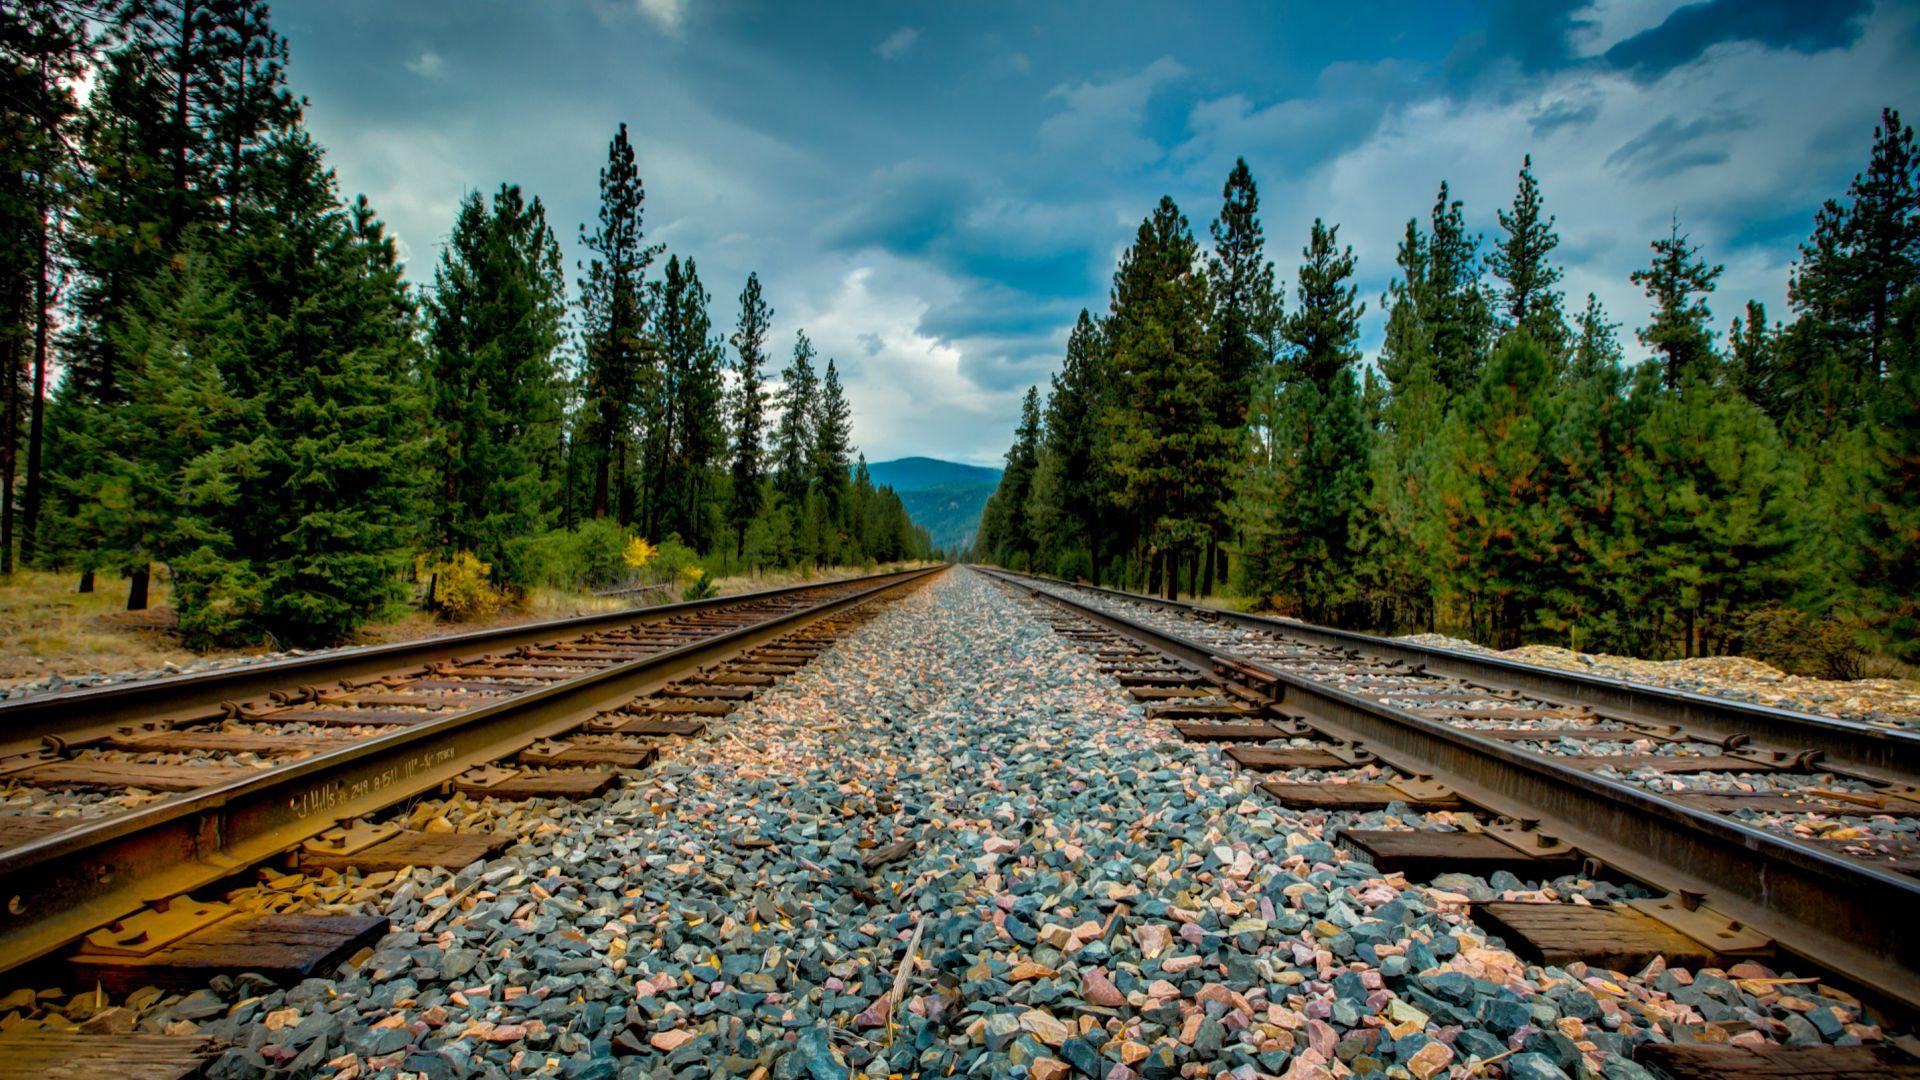 Railroad HD Wallpaper  Background Image  1920x1080  ID:598461  Wallpaper Abyss